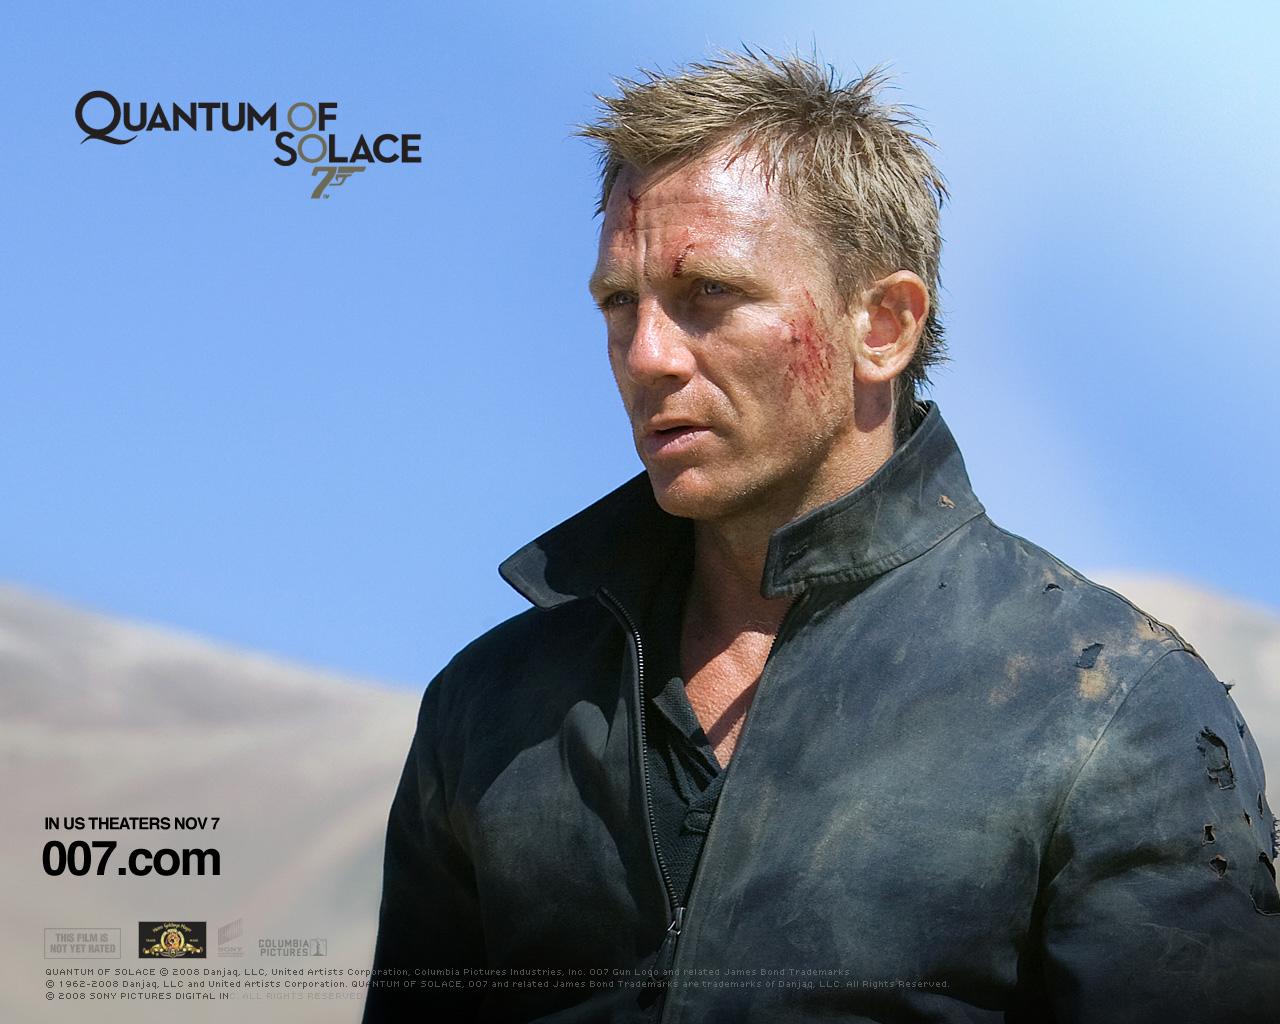 James Bond Movies Quantum Of Solace Wallpaper Universal Exports